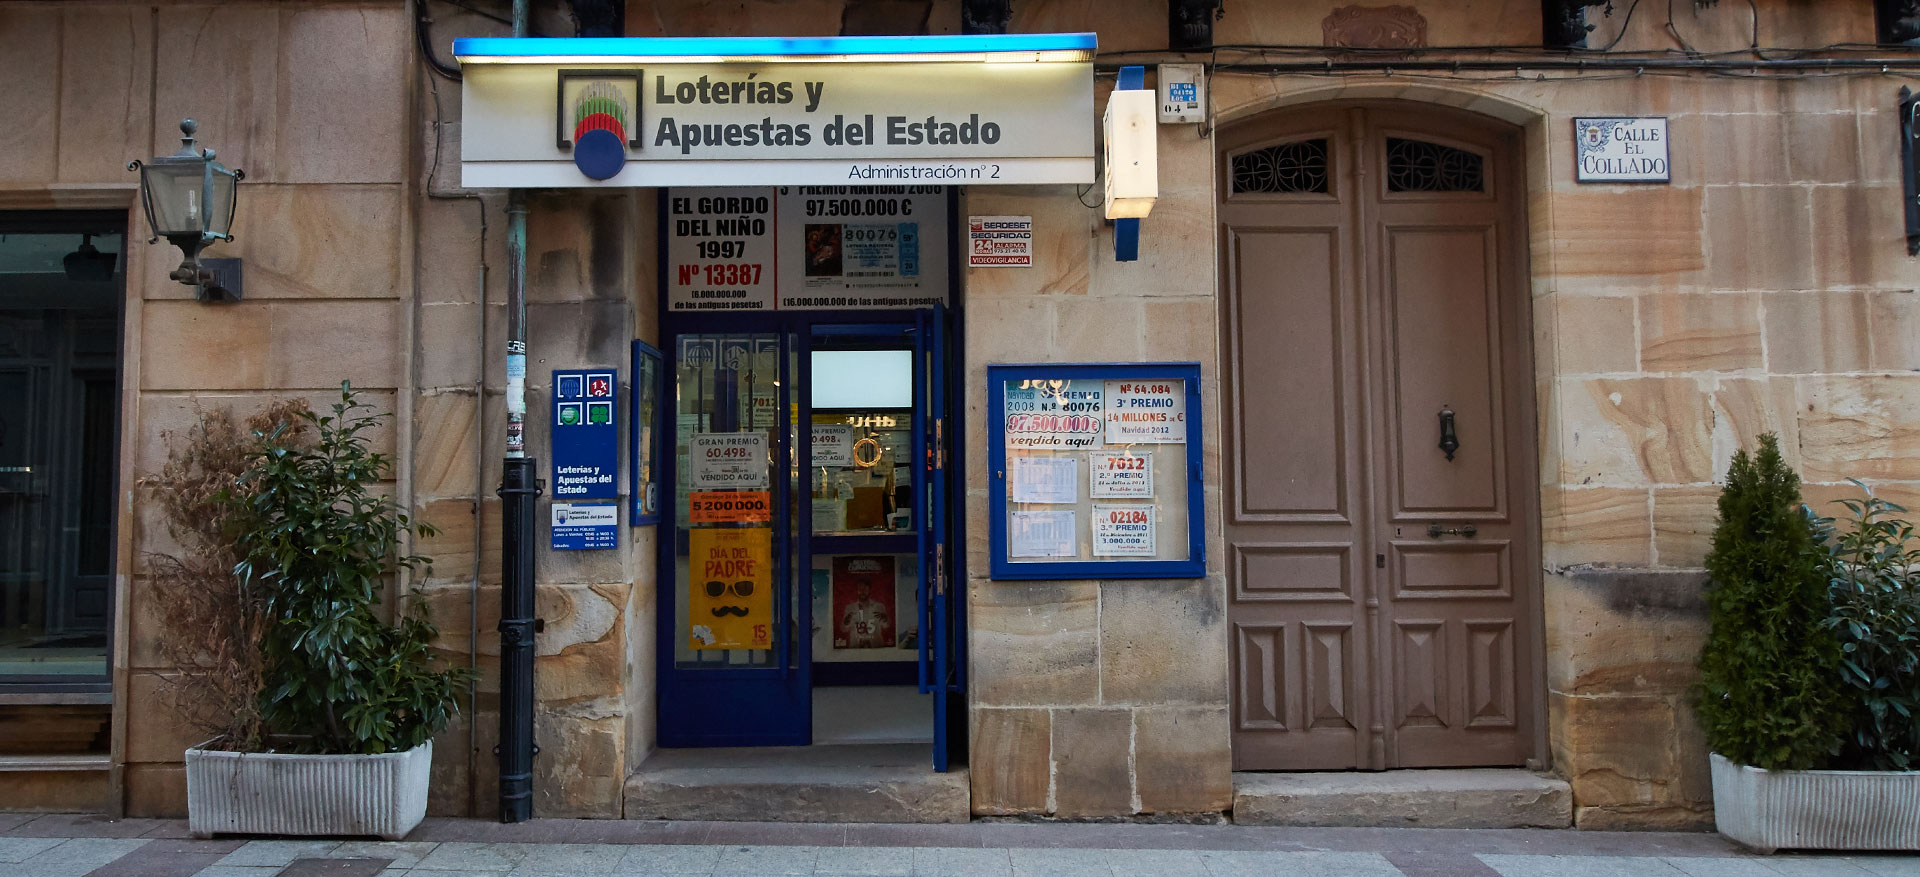 Comprar lotería de Soria